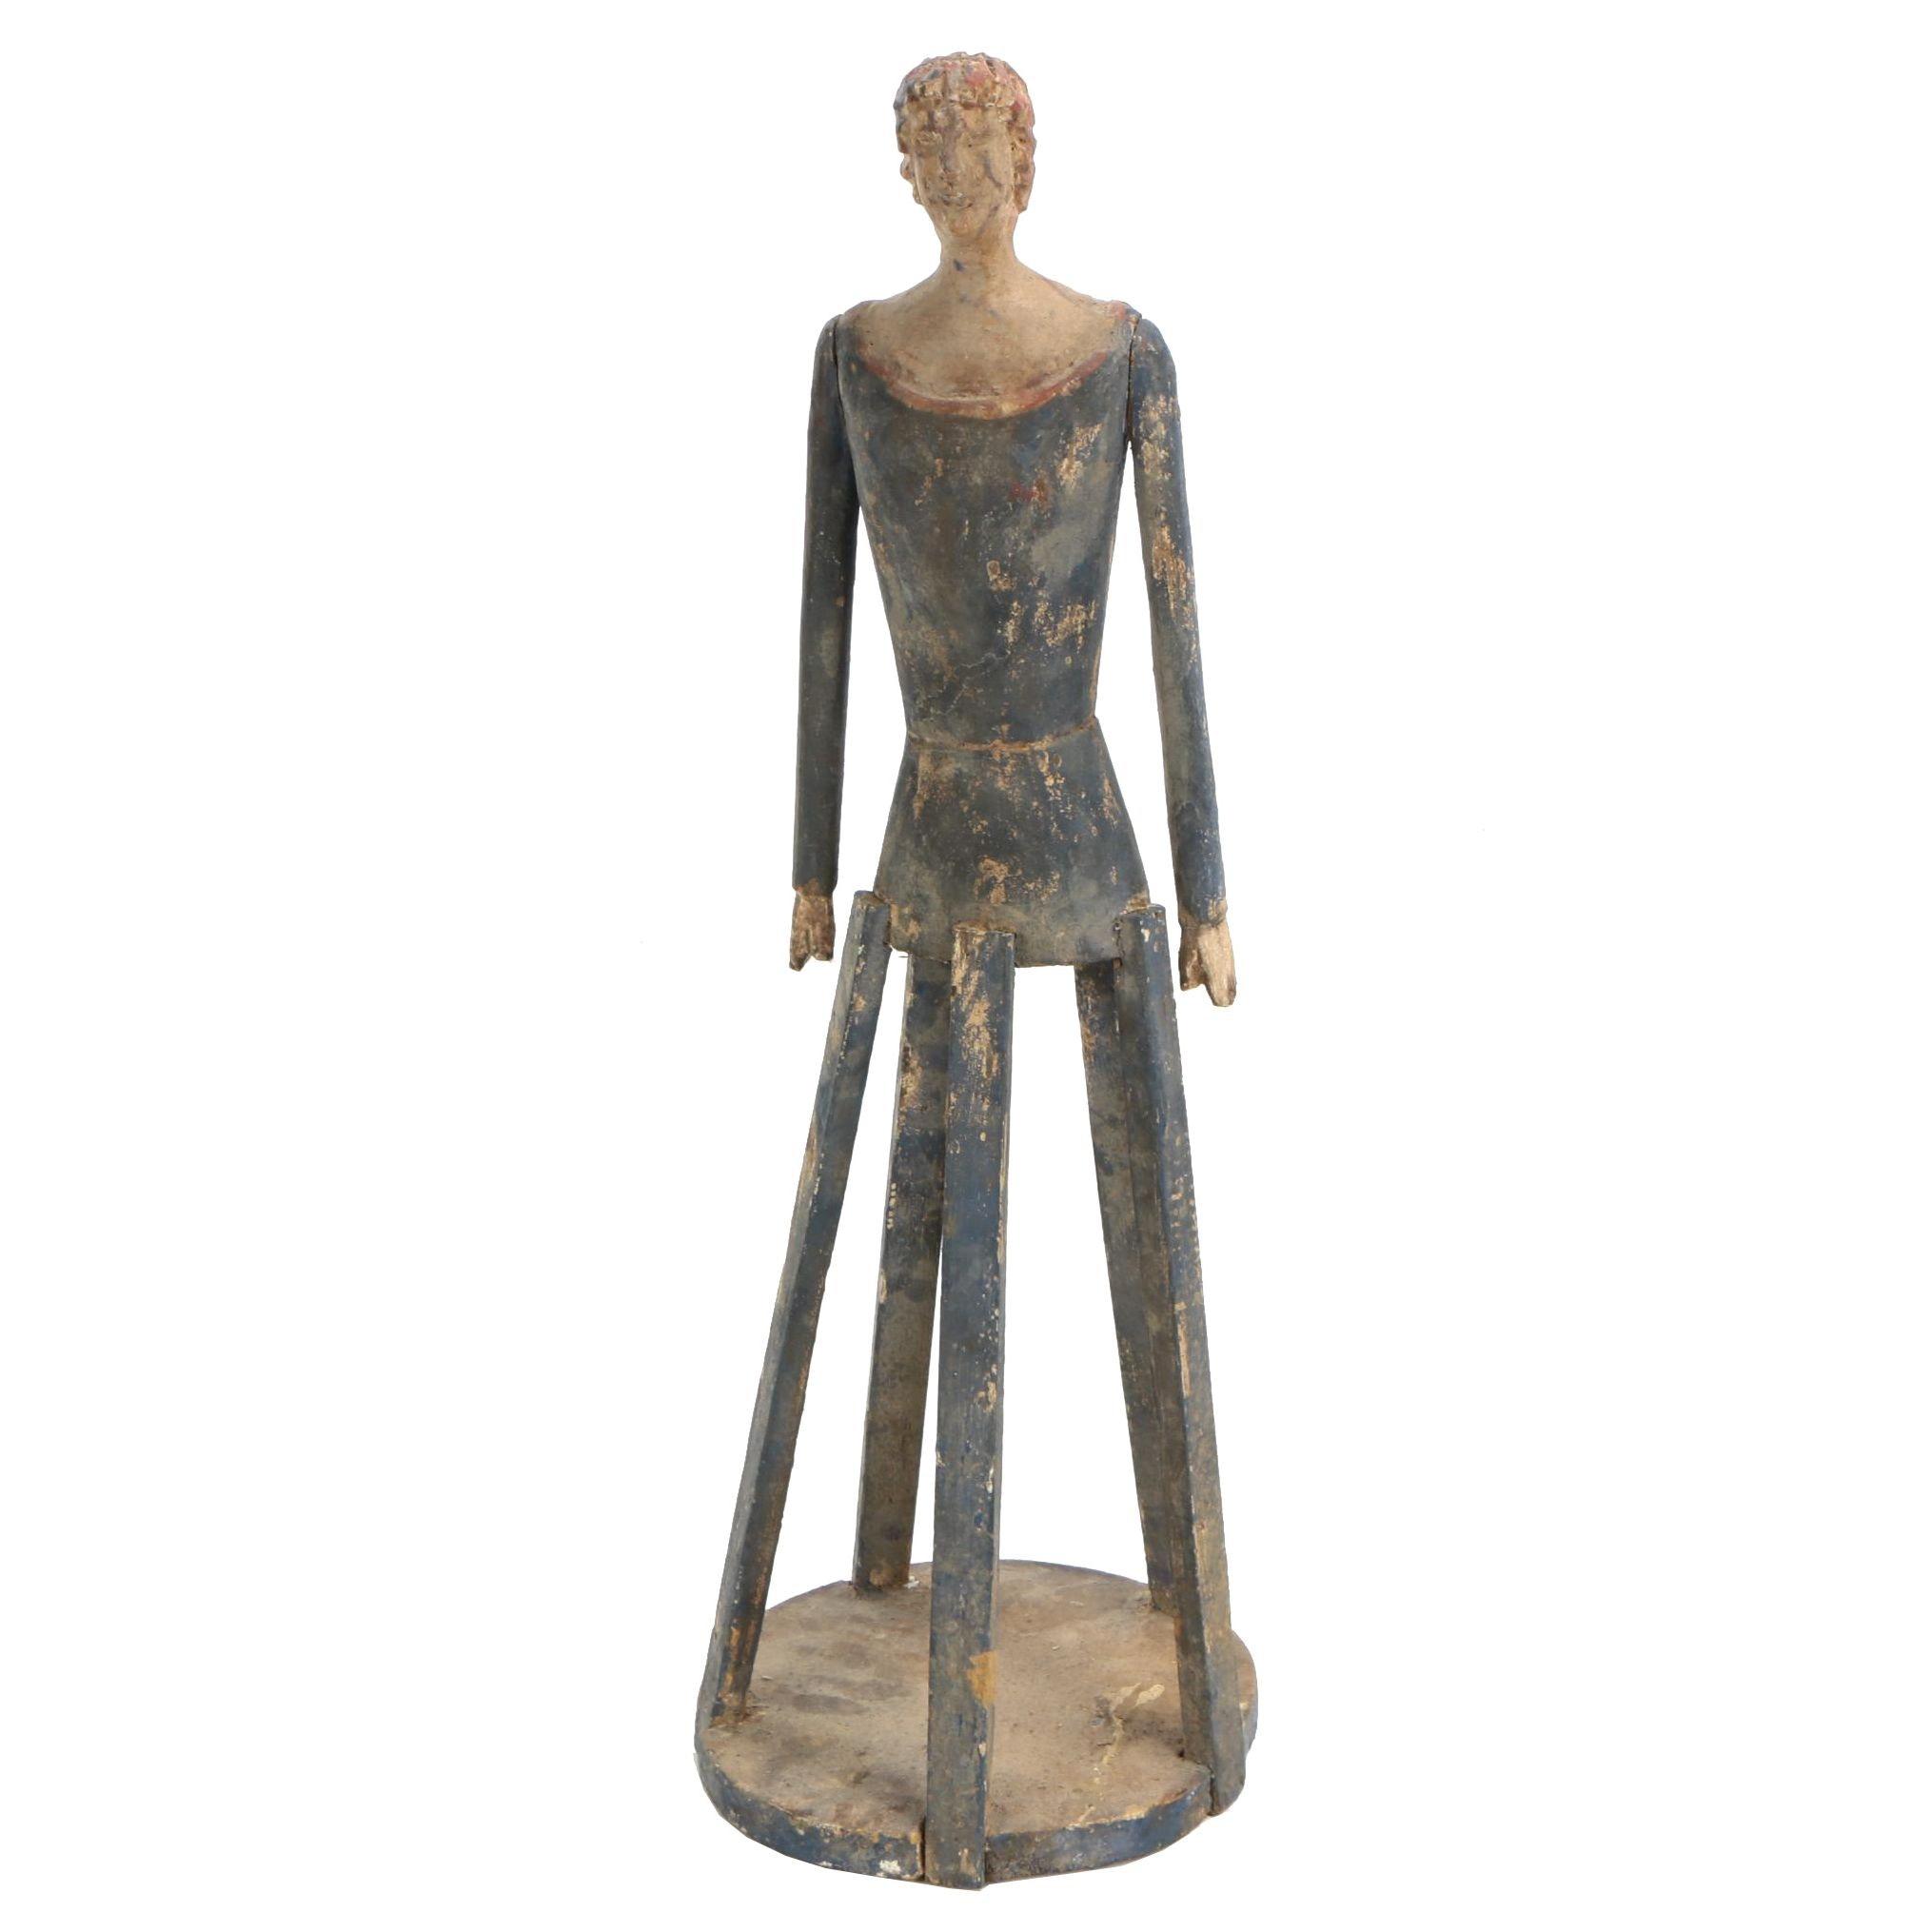 Folk Art Style Polychromed Wooden Santos Cage Doll